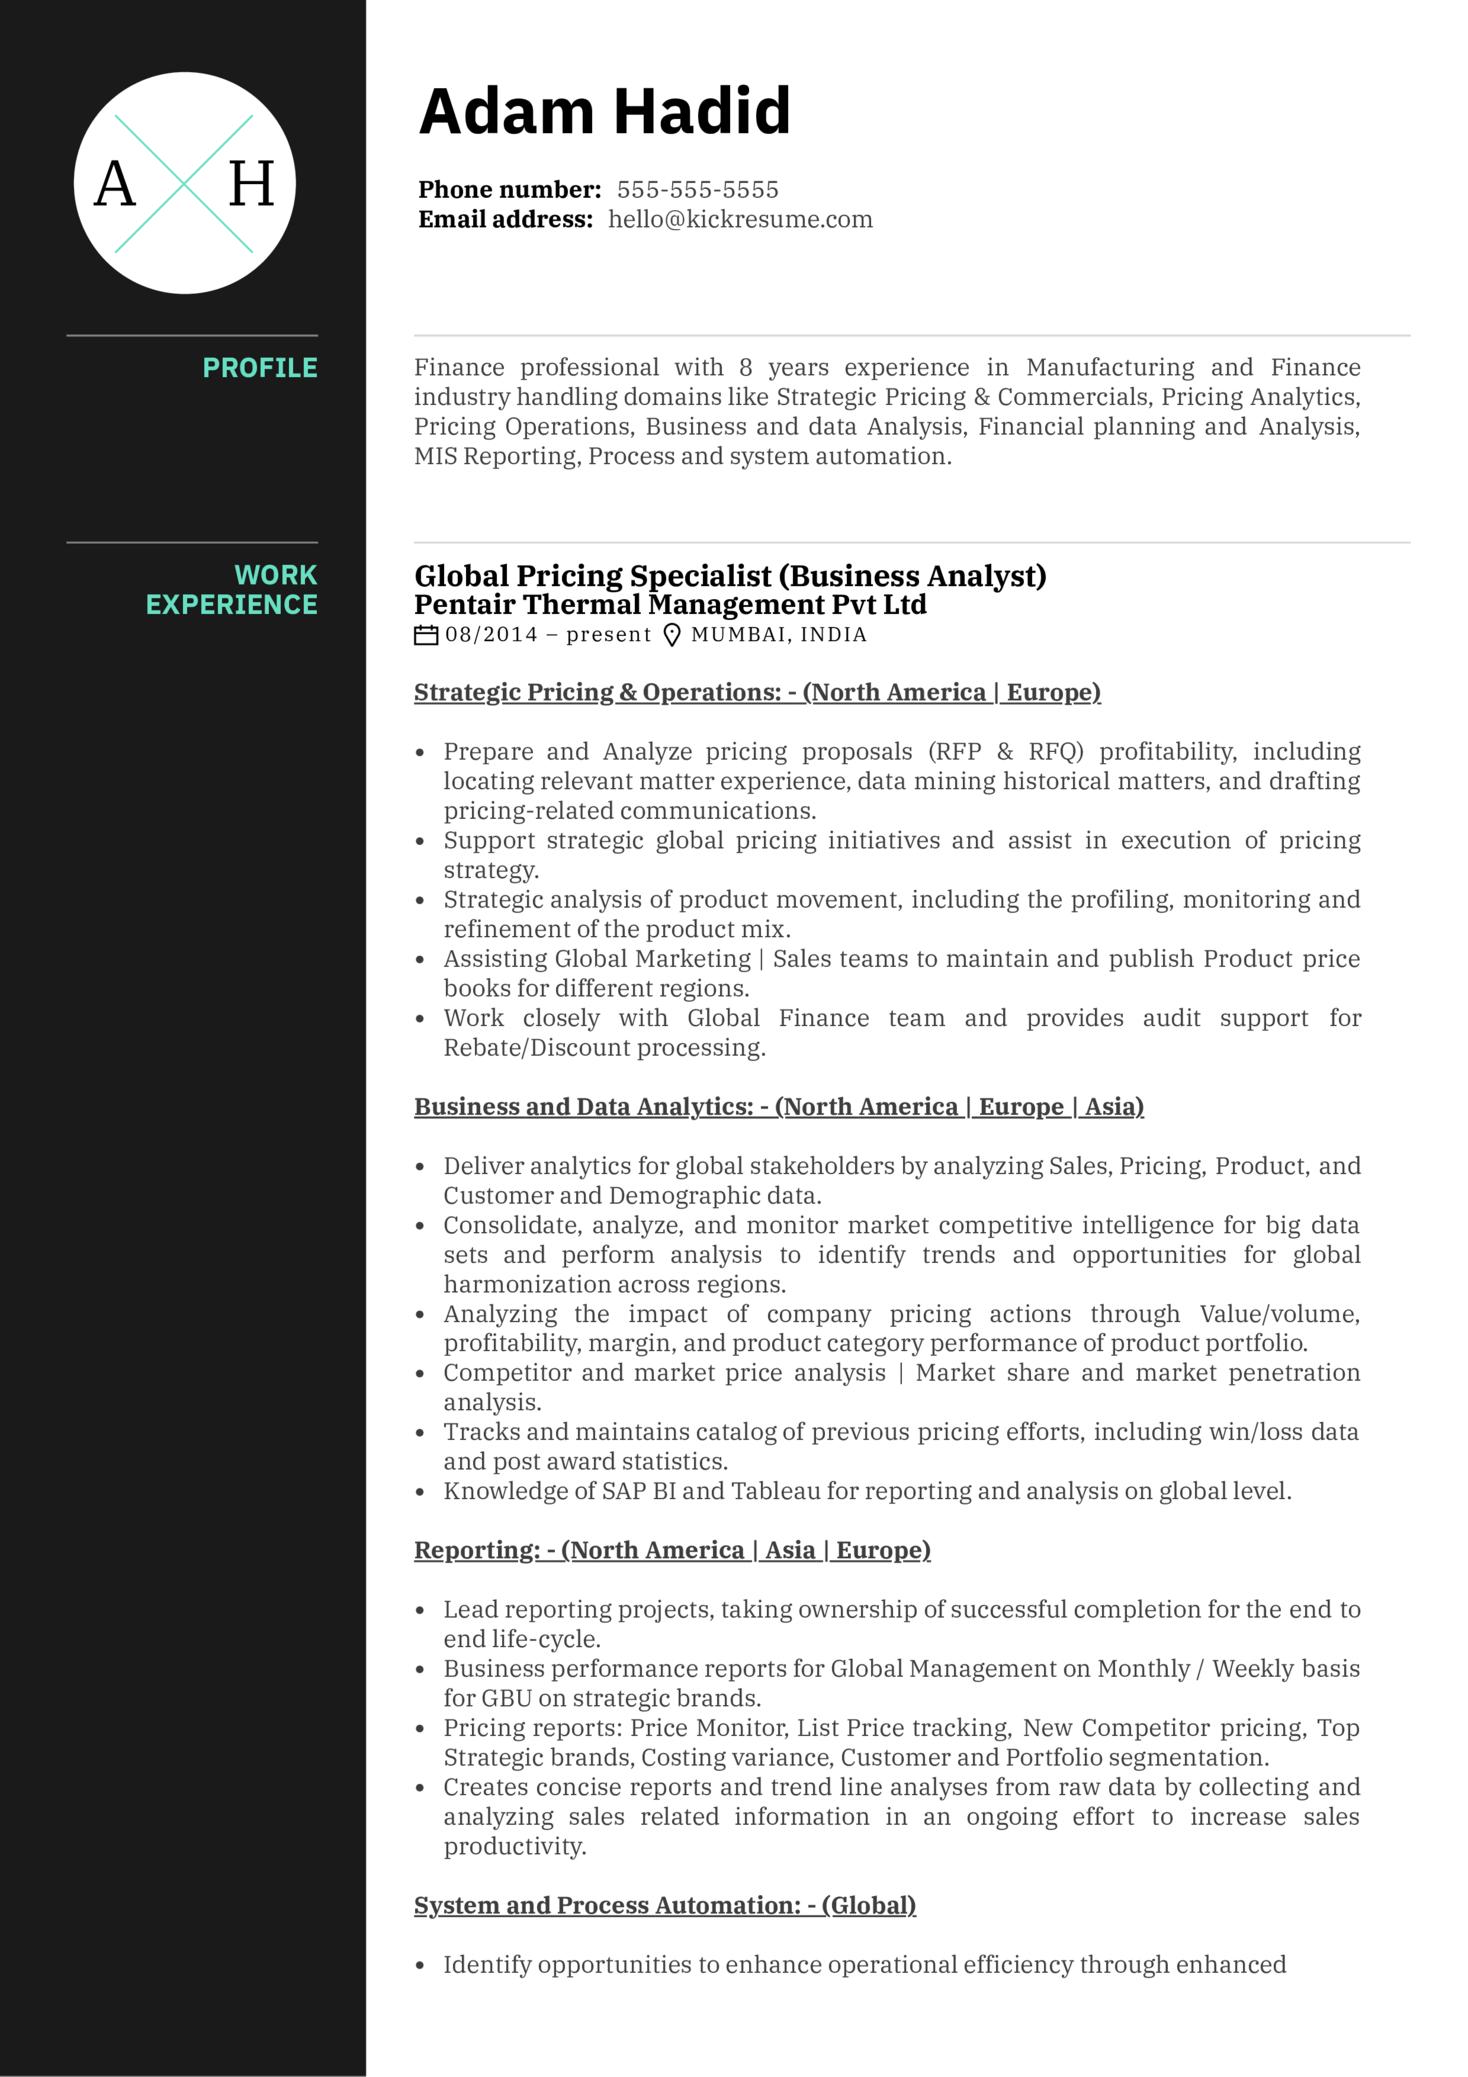 Honeywell Pricing Analyst Resume Example (Part 1)